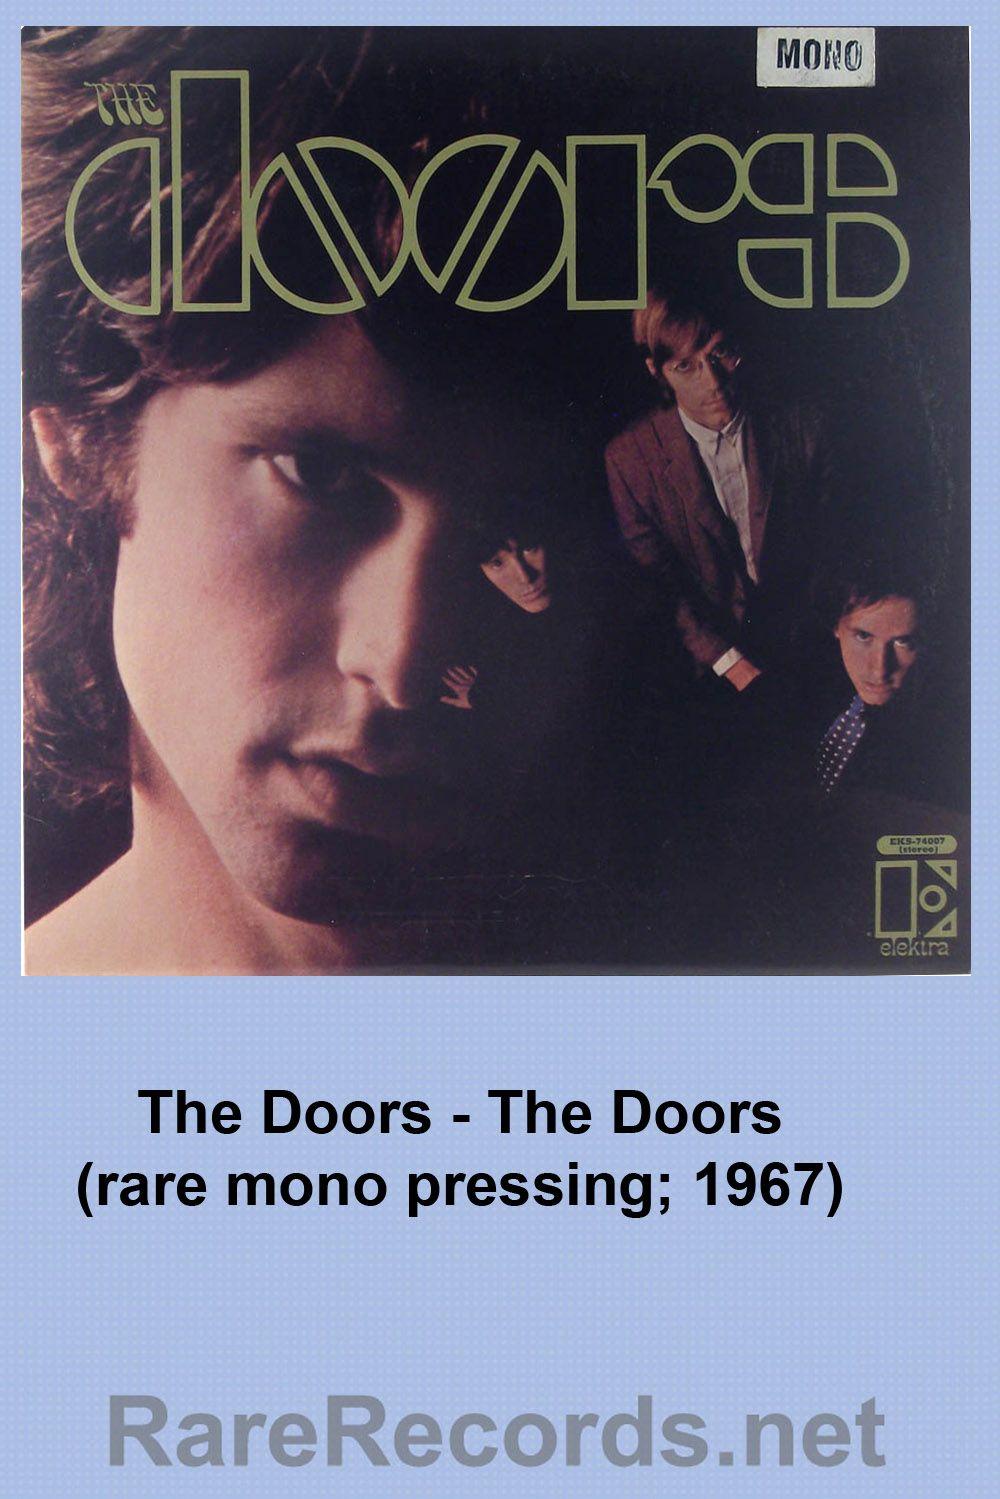 Doors Songs & All Wood And Doors Album Cover.